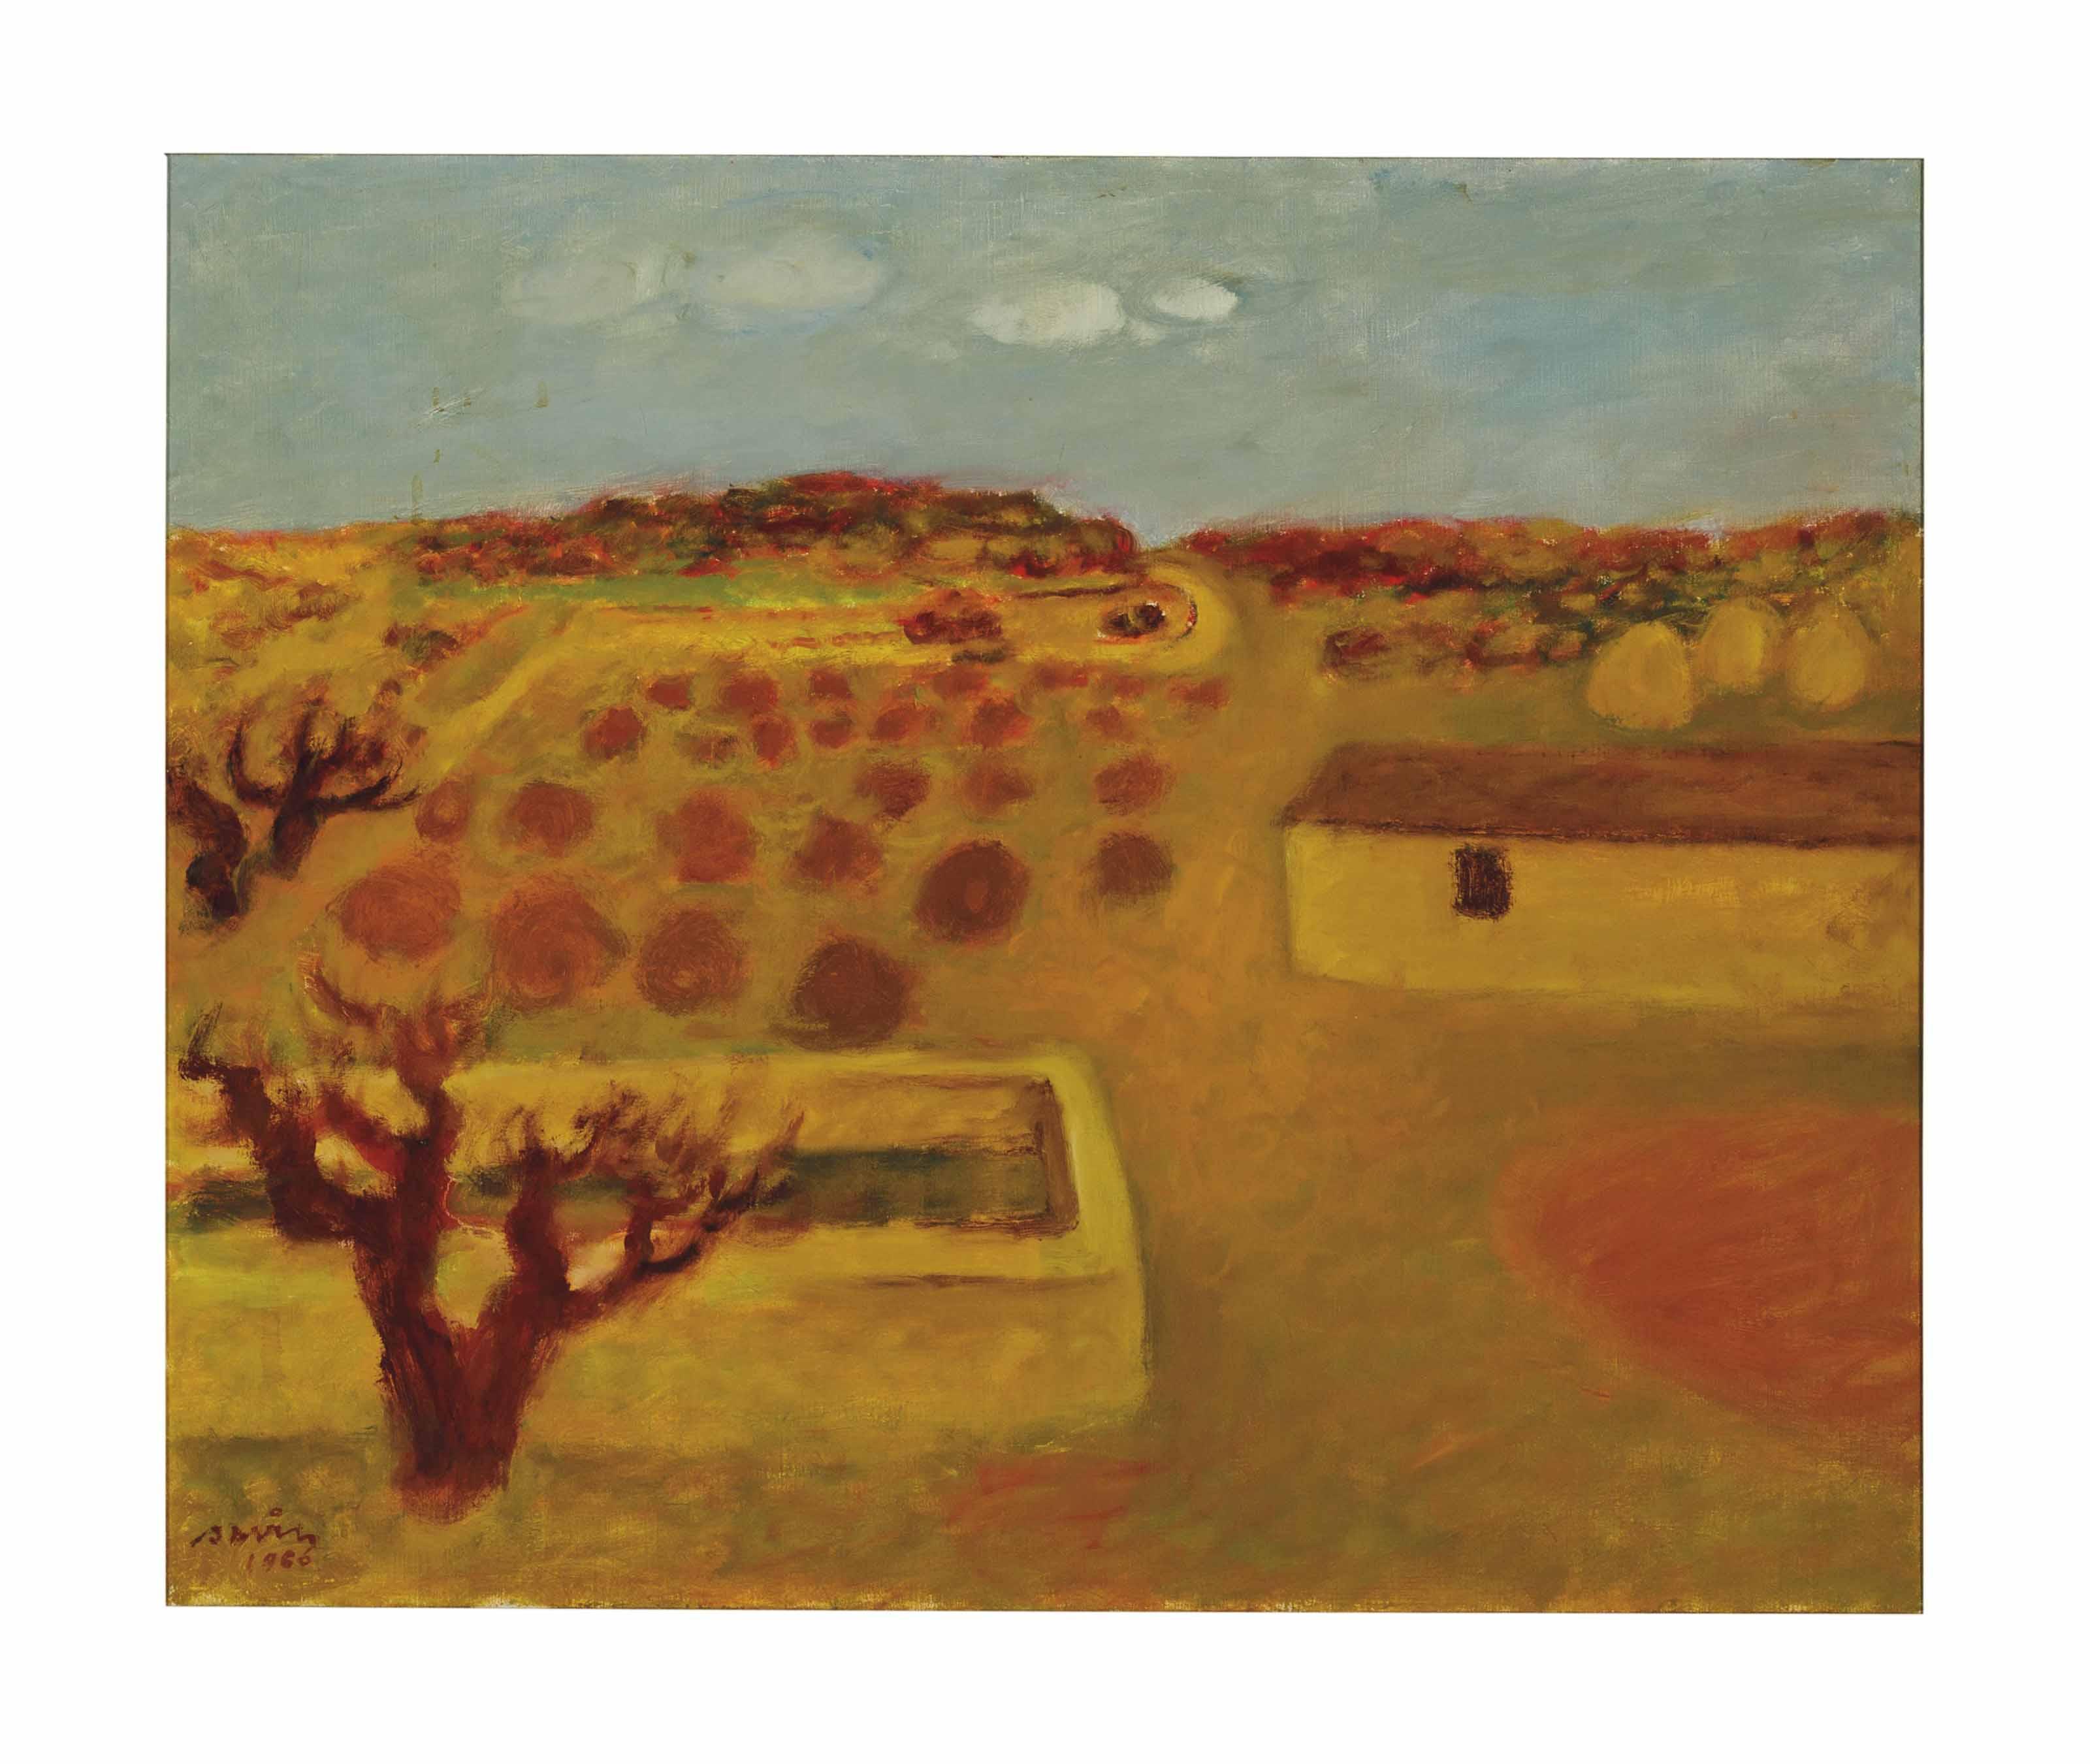 Maurice Louis Savin (French, 1894-1973)